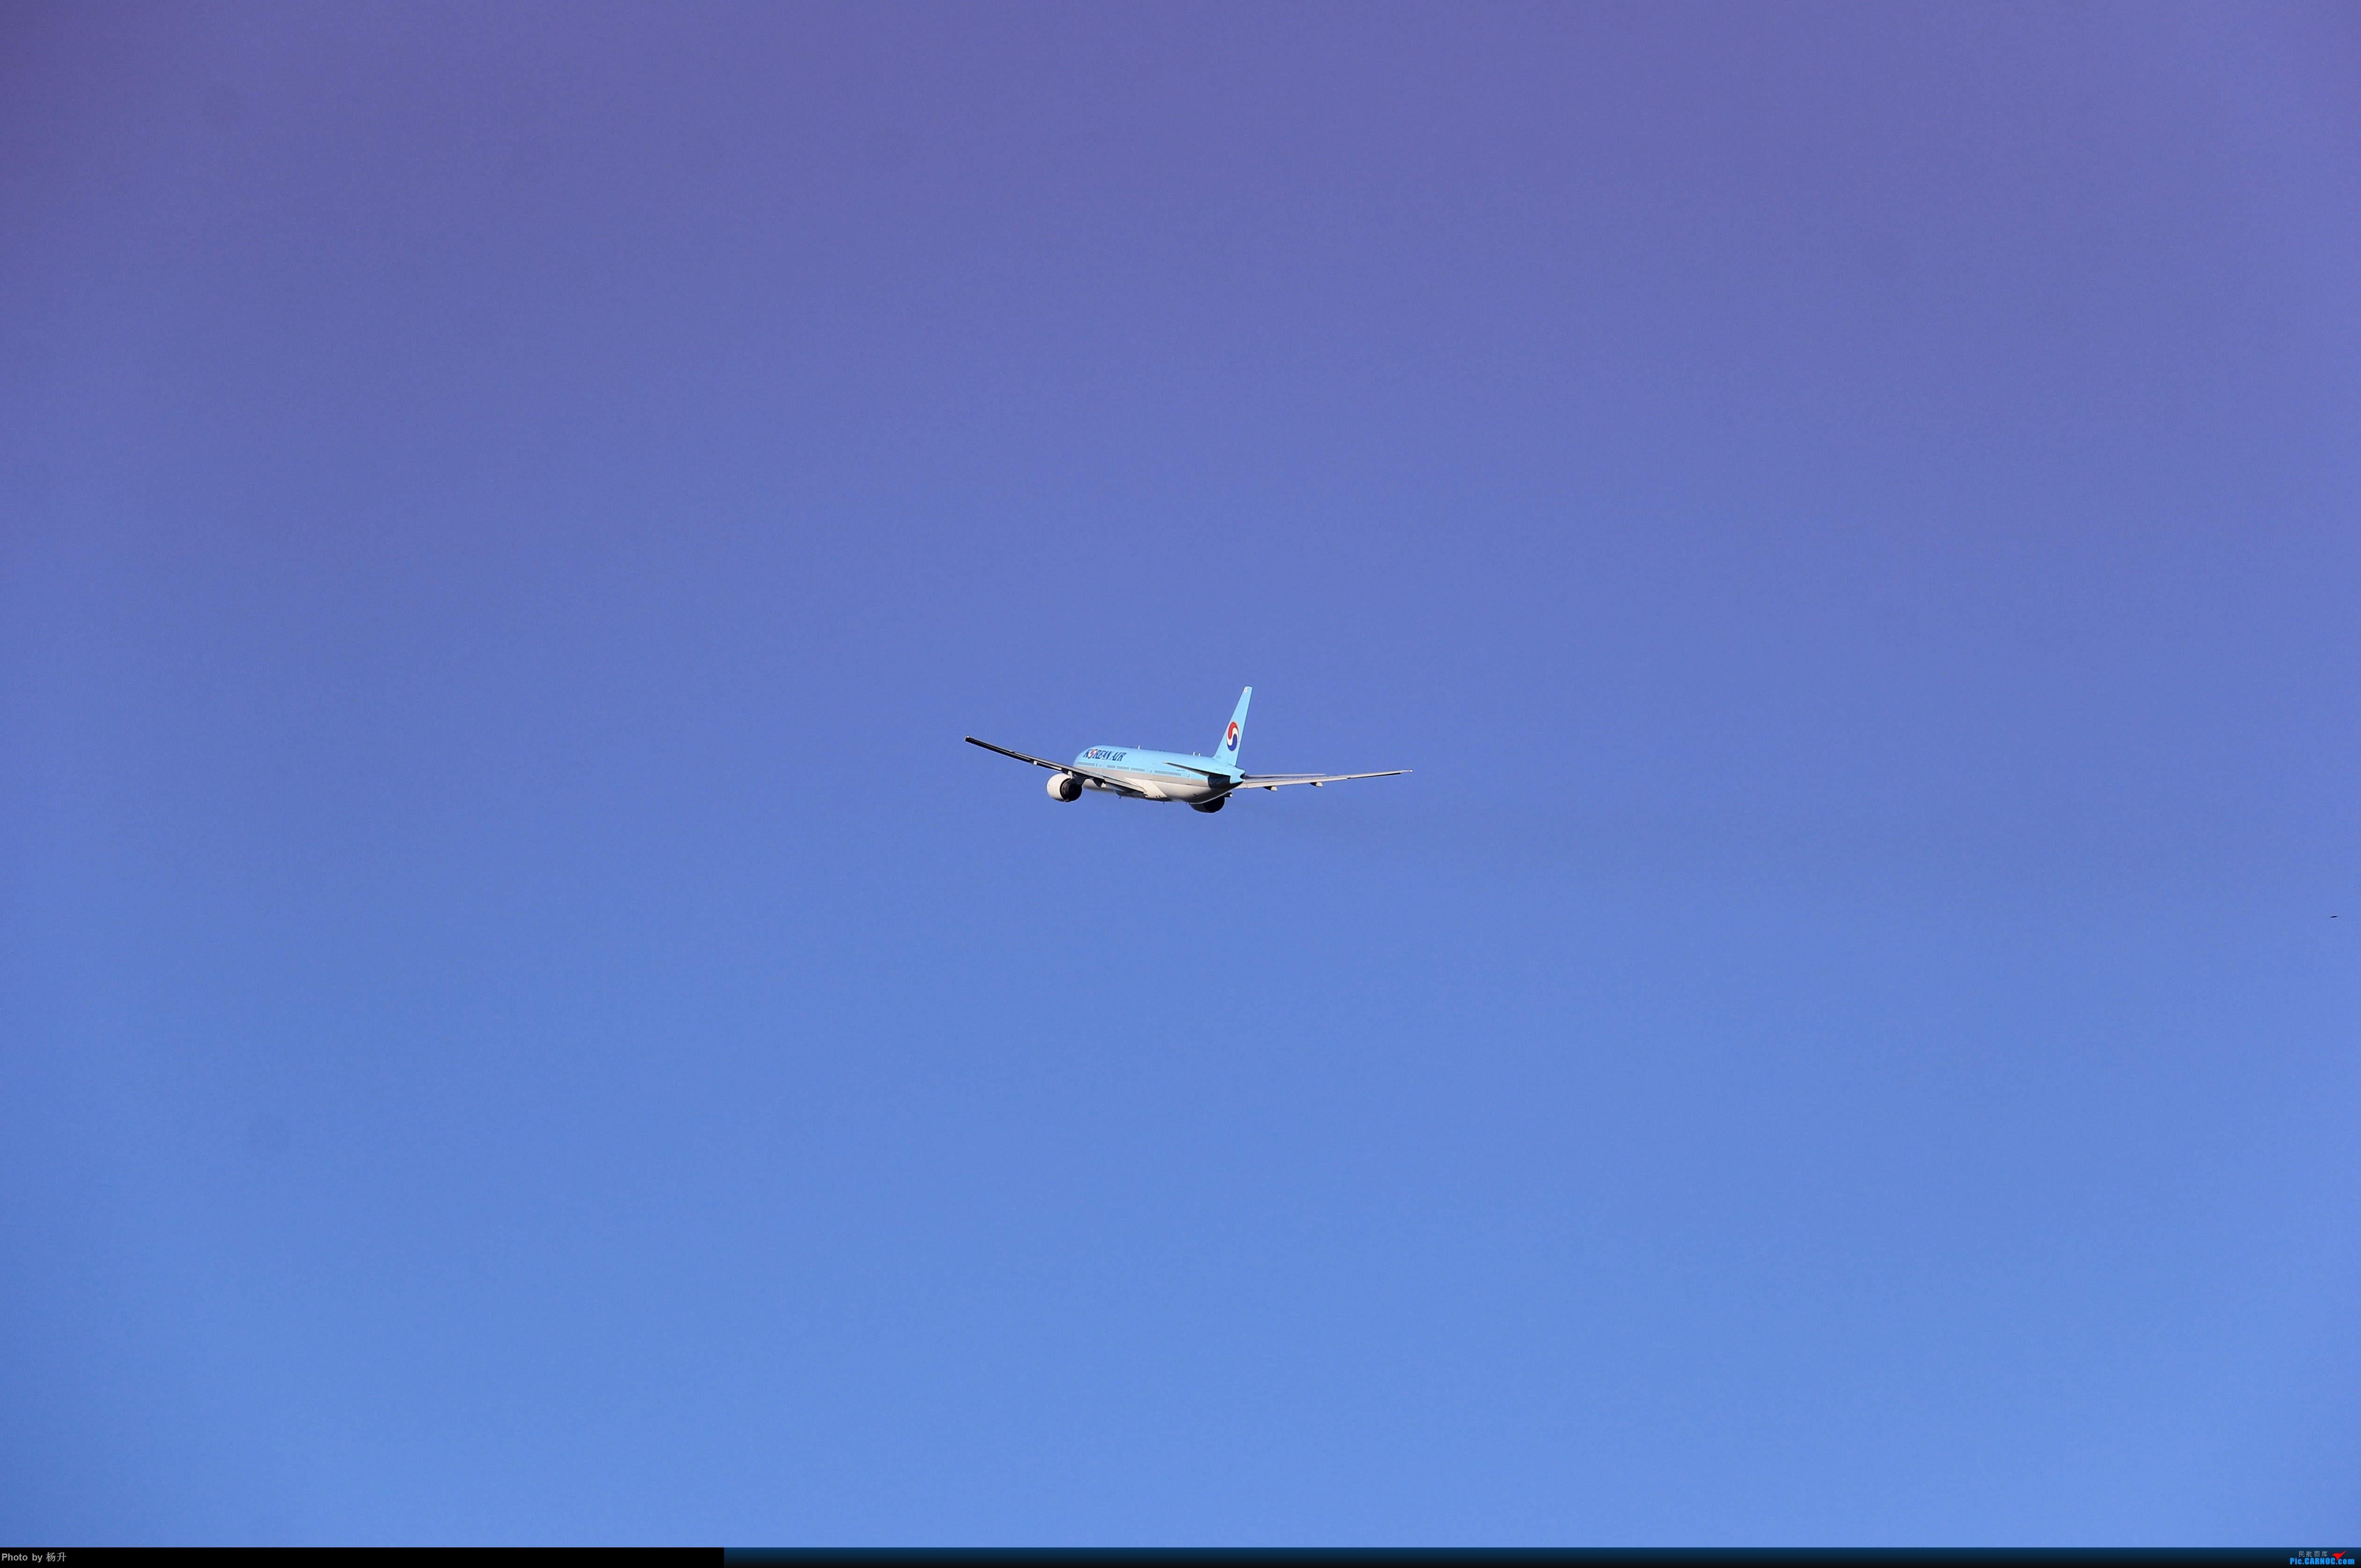 Re:[原创]【SHE】新人沈阳桃仙17/18拍机首发 BOEING 777-200  中国沈阳桃仙国际机场